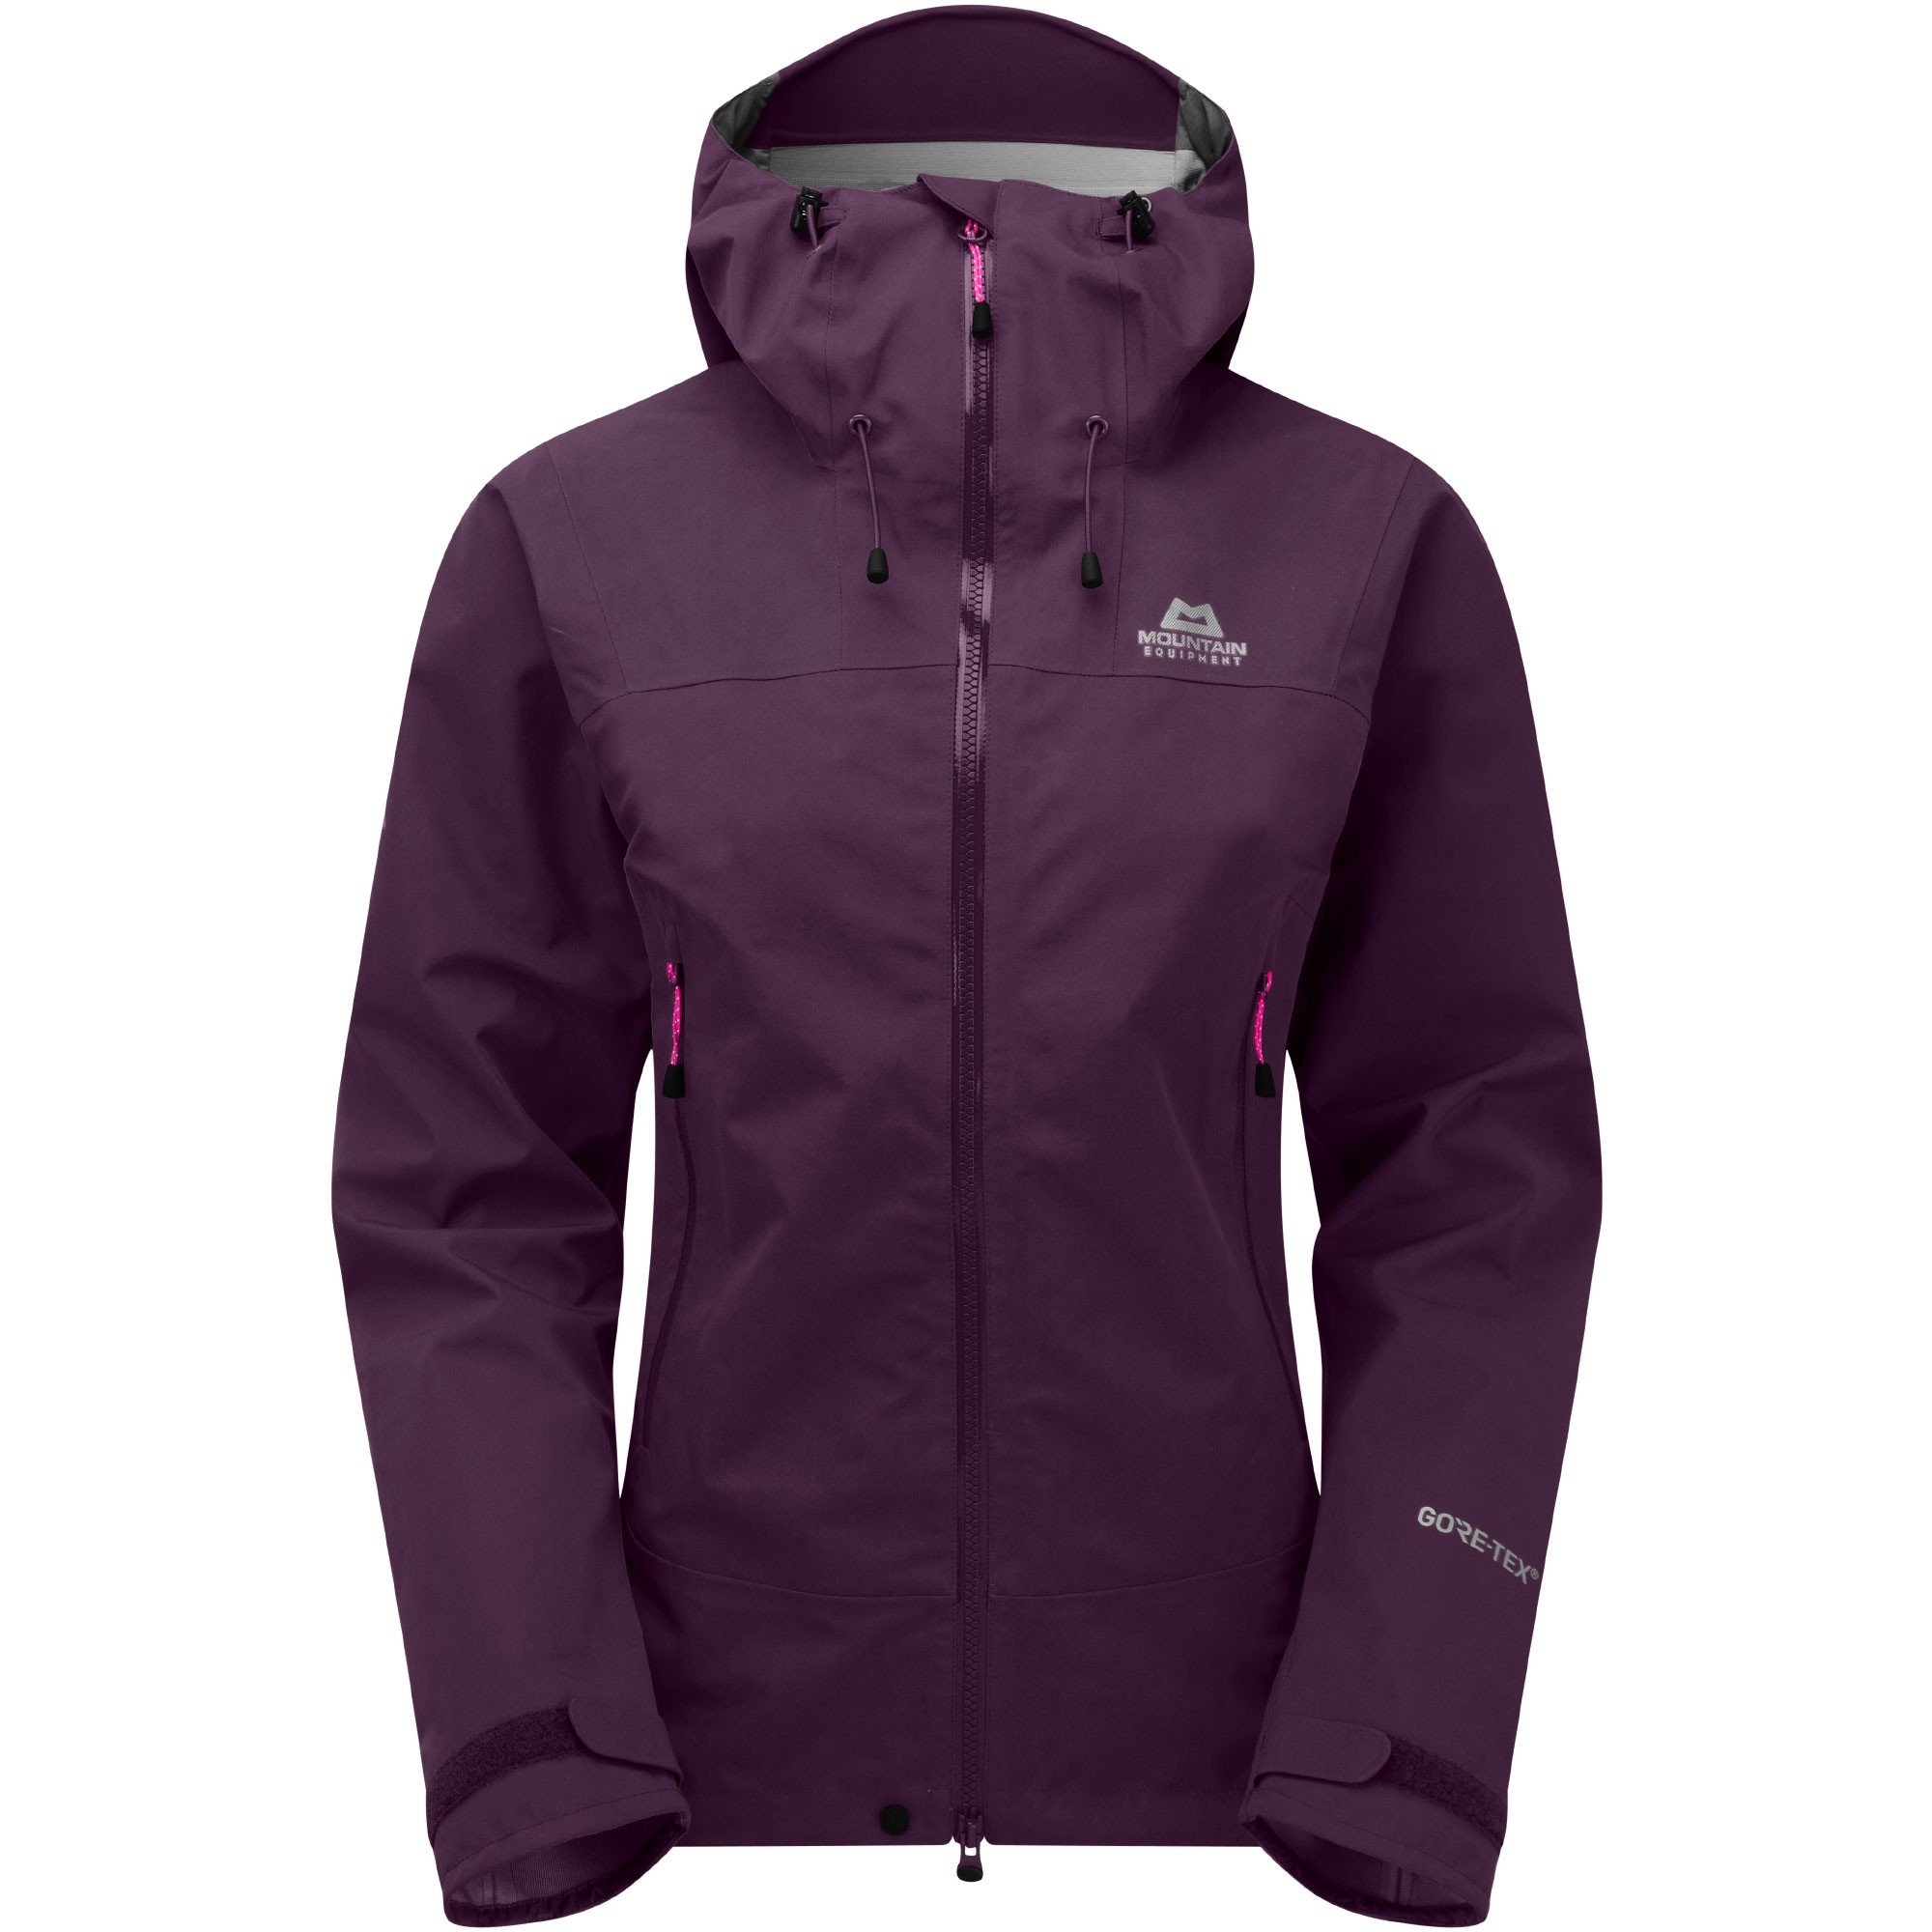 Mountain Equipment Women's Rupal Jacket - Blackberry